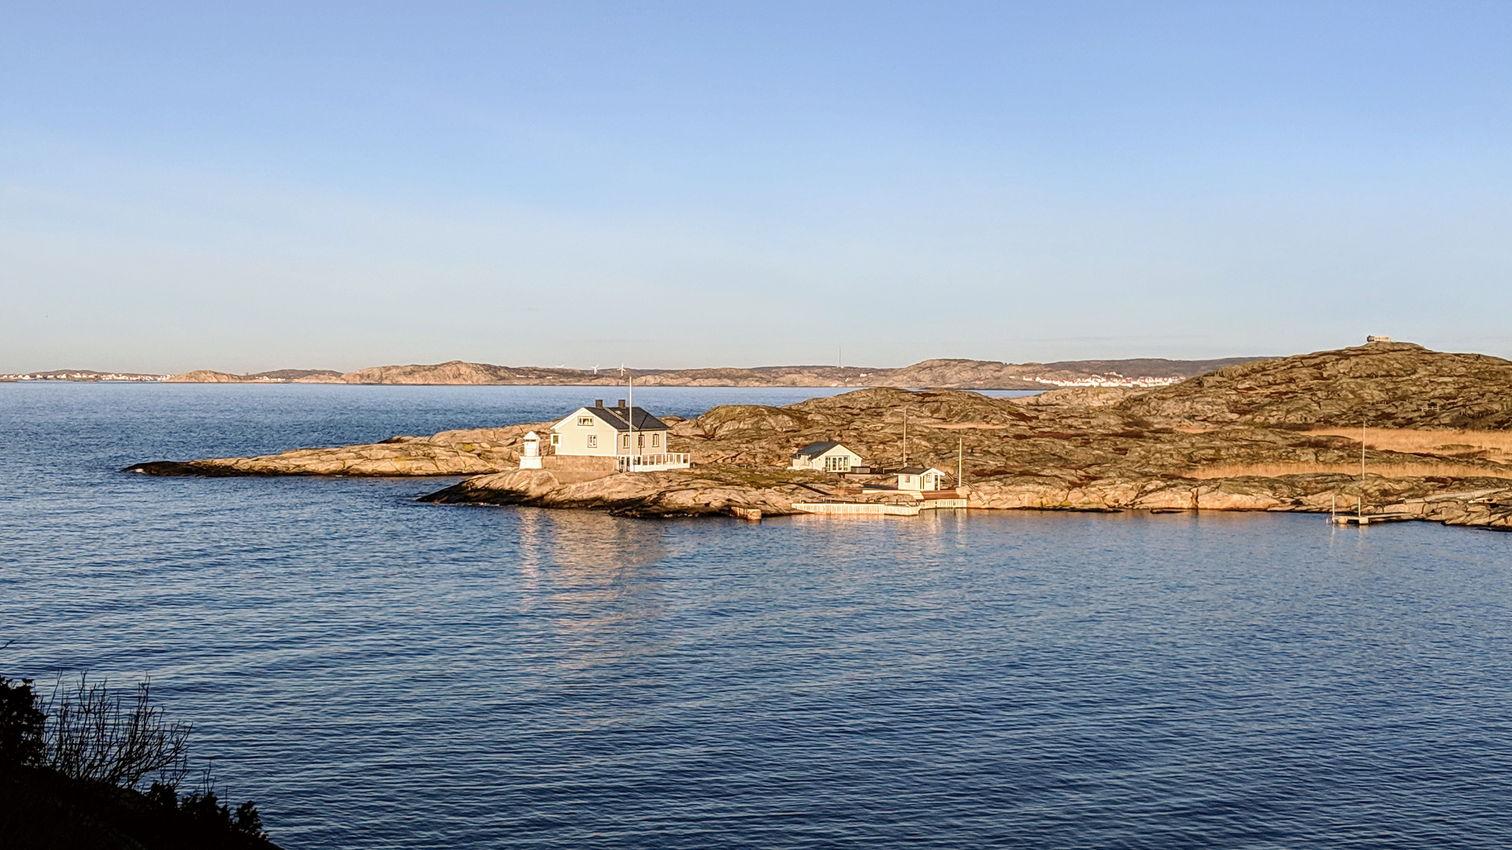 Coastline at Marstrand